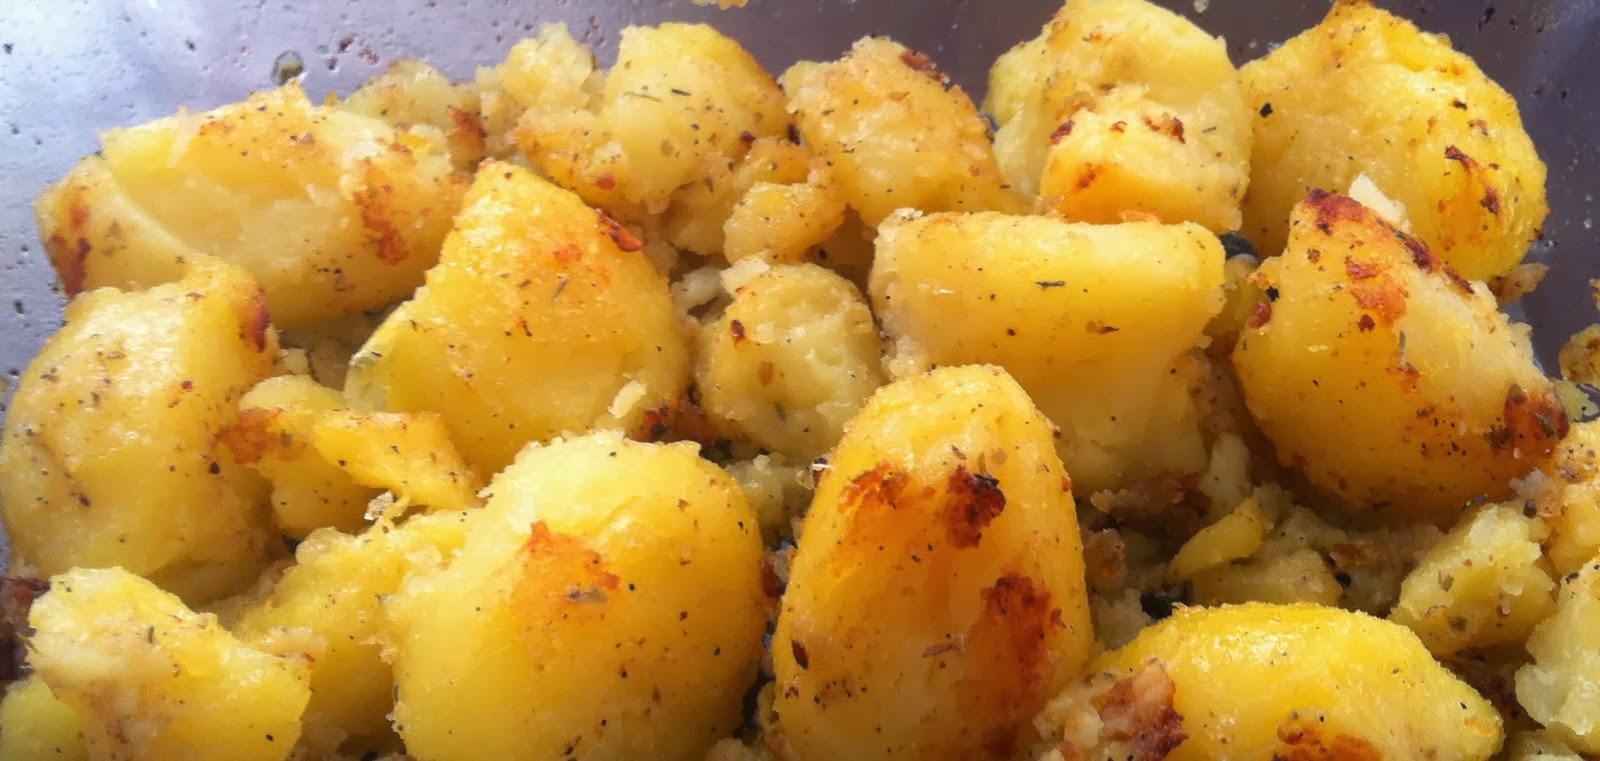 Roasted Gold Potatoes  Vegan Adjacent Roasted Gold Potatoes